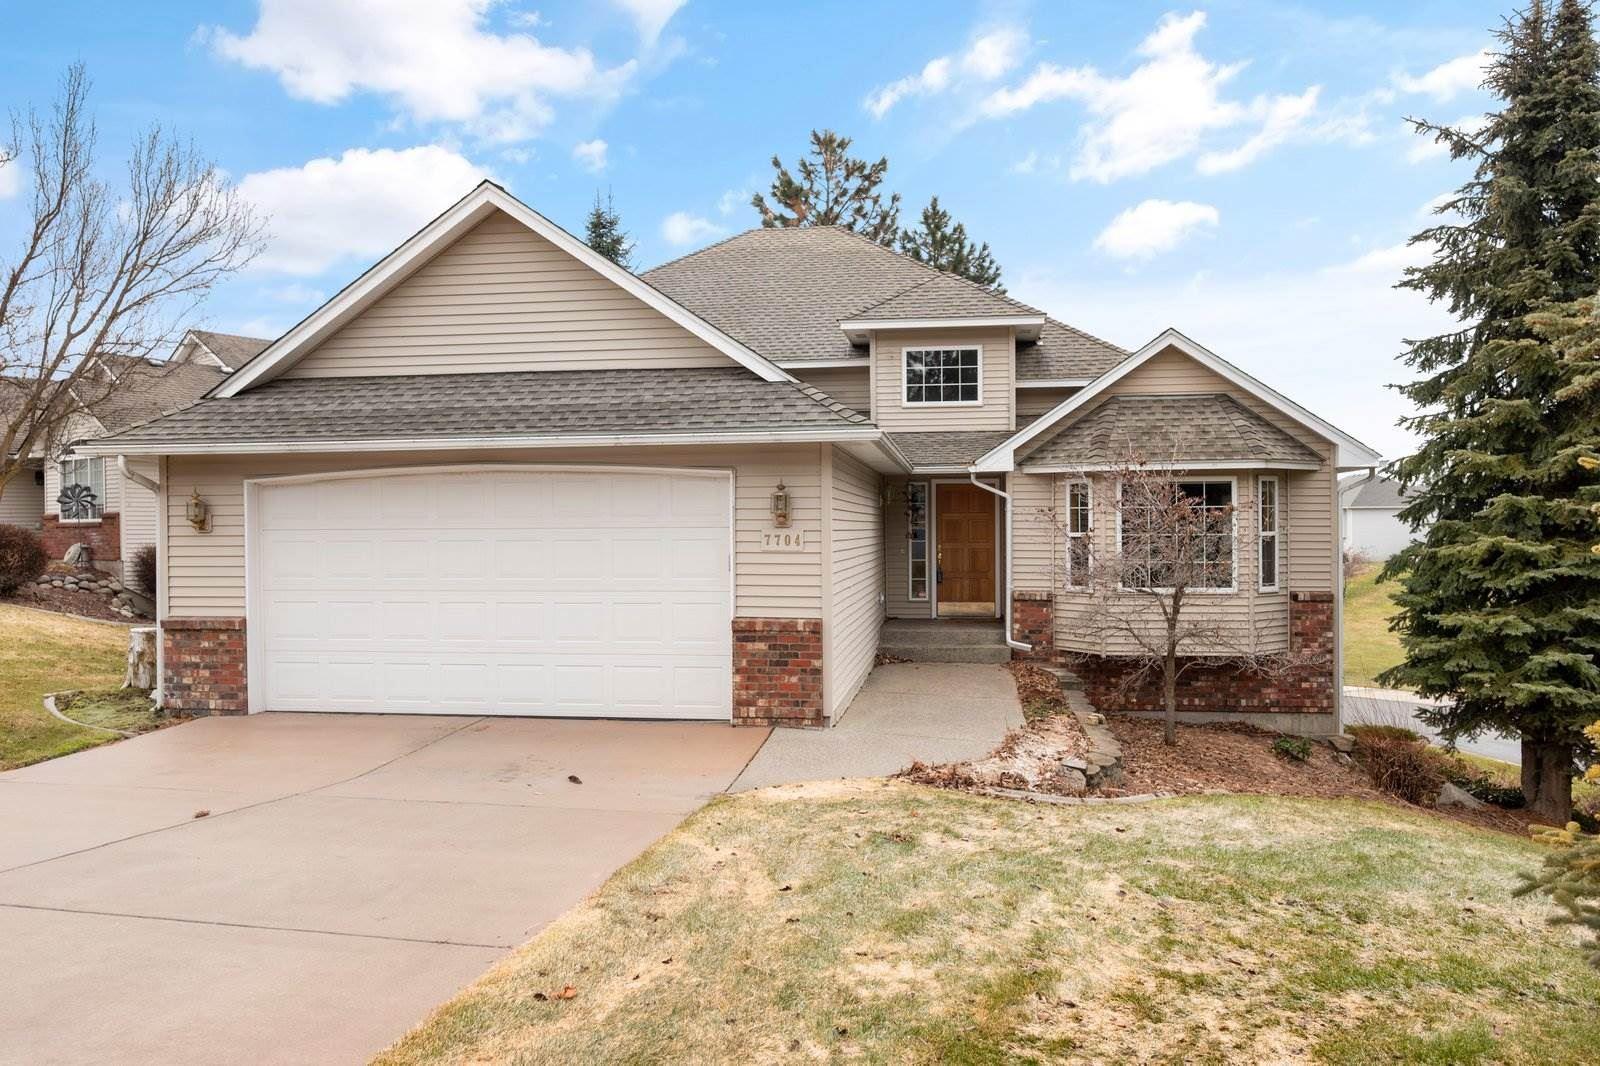 7704 E Woodland Ln, Spokane, WA 99212 - #: 202110796